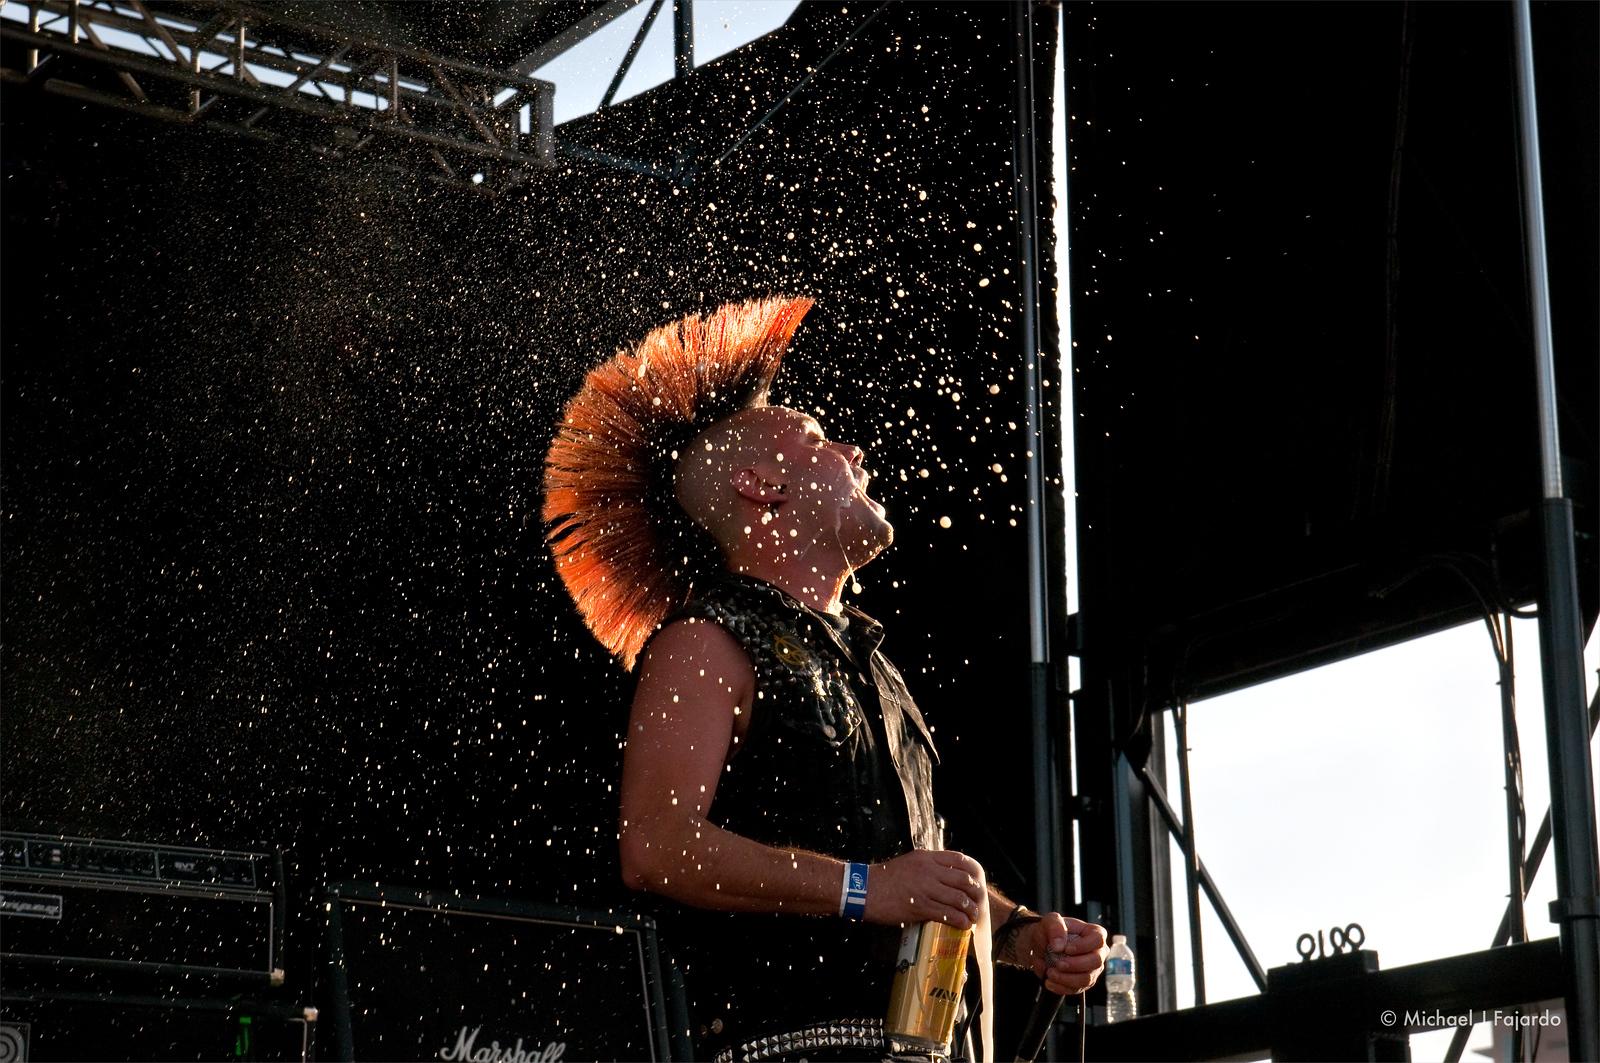 Dave Tejas<br /> Krum Bums<br /> BYO Records' 13th Annual Punk Rock Bowling Music Festival<br /> Las Vegas, NV  May 29, 2011